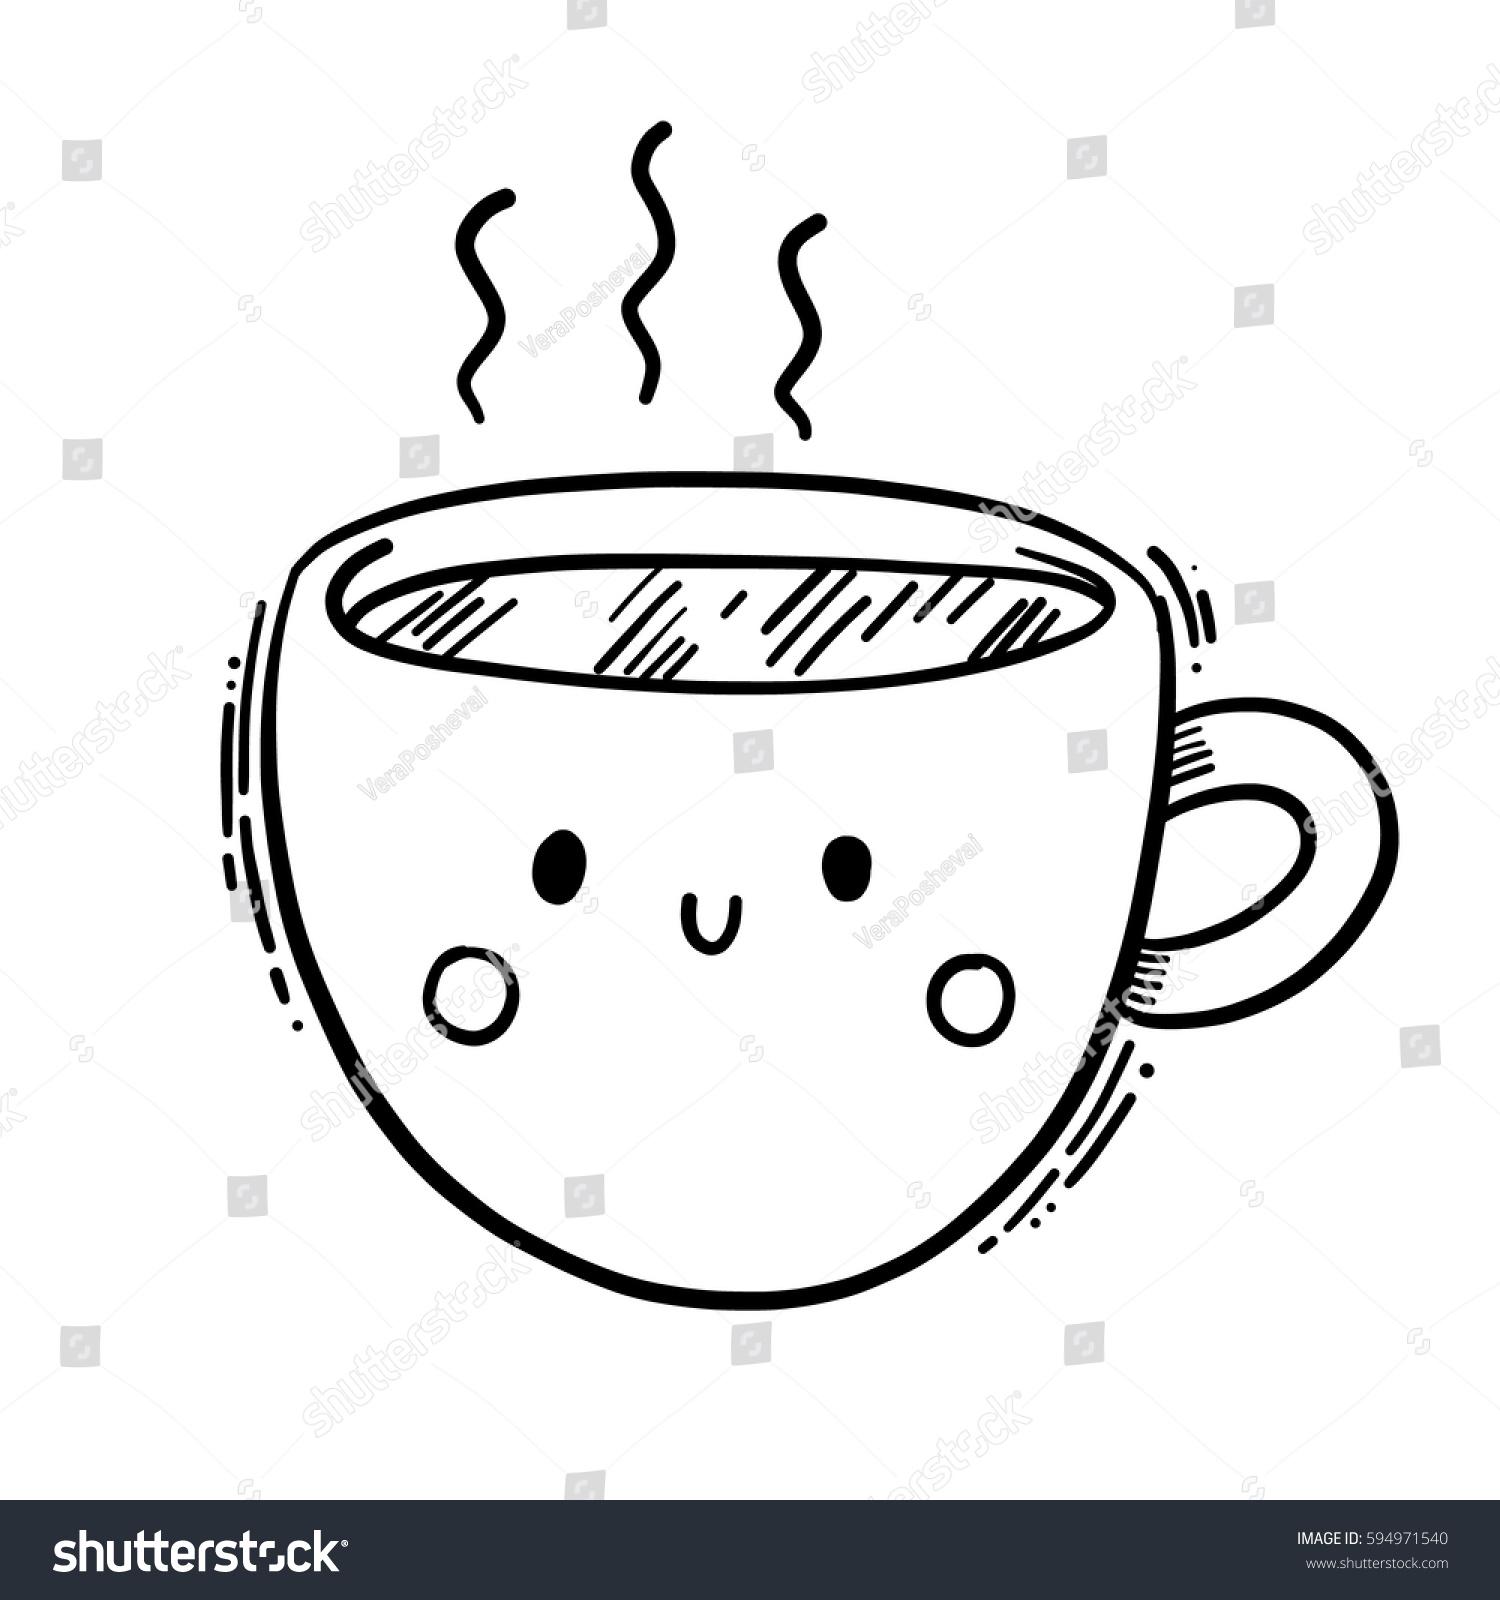 Cute Isolated Vector Line Illustration Mug Stock Vector Royalty Free 594971540